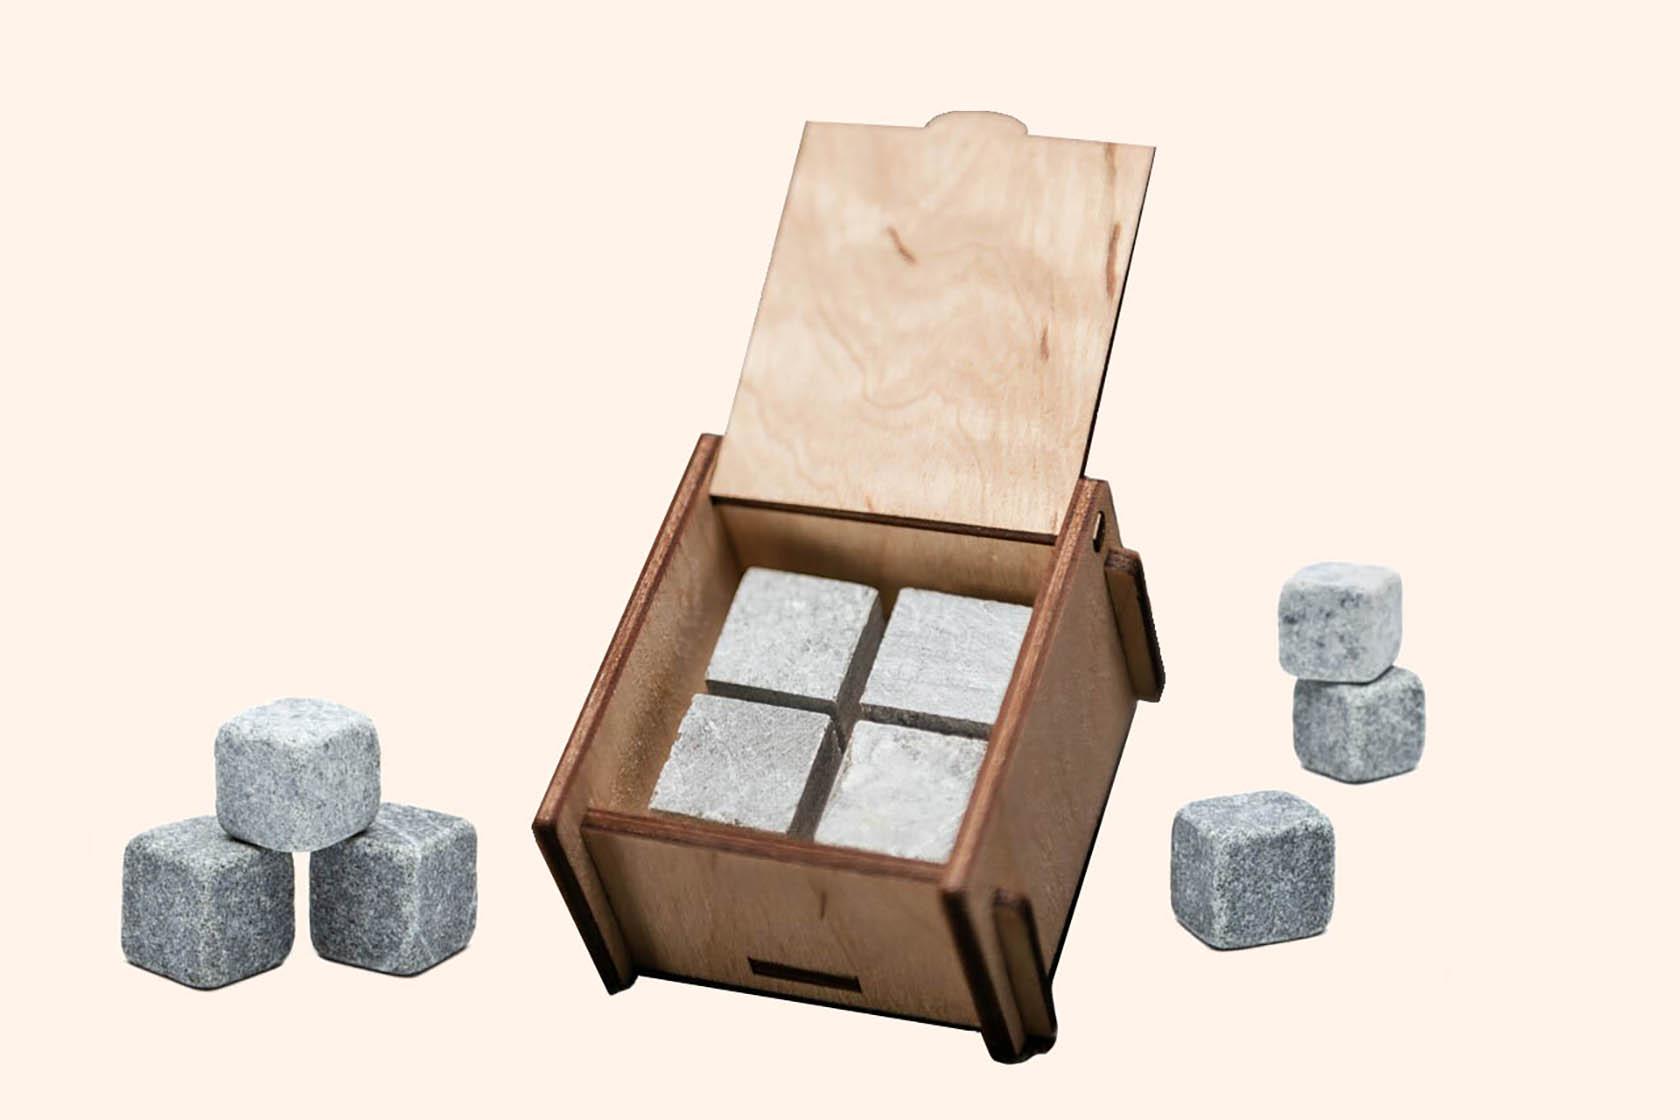 Материал камней для виски